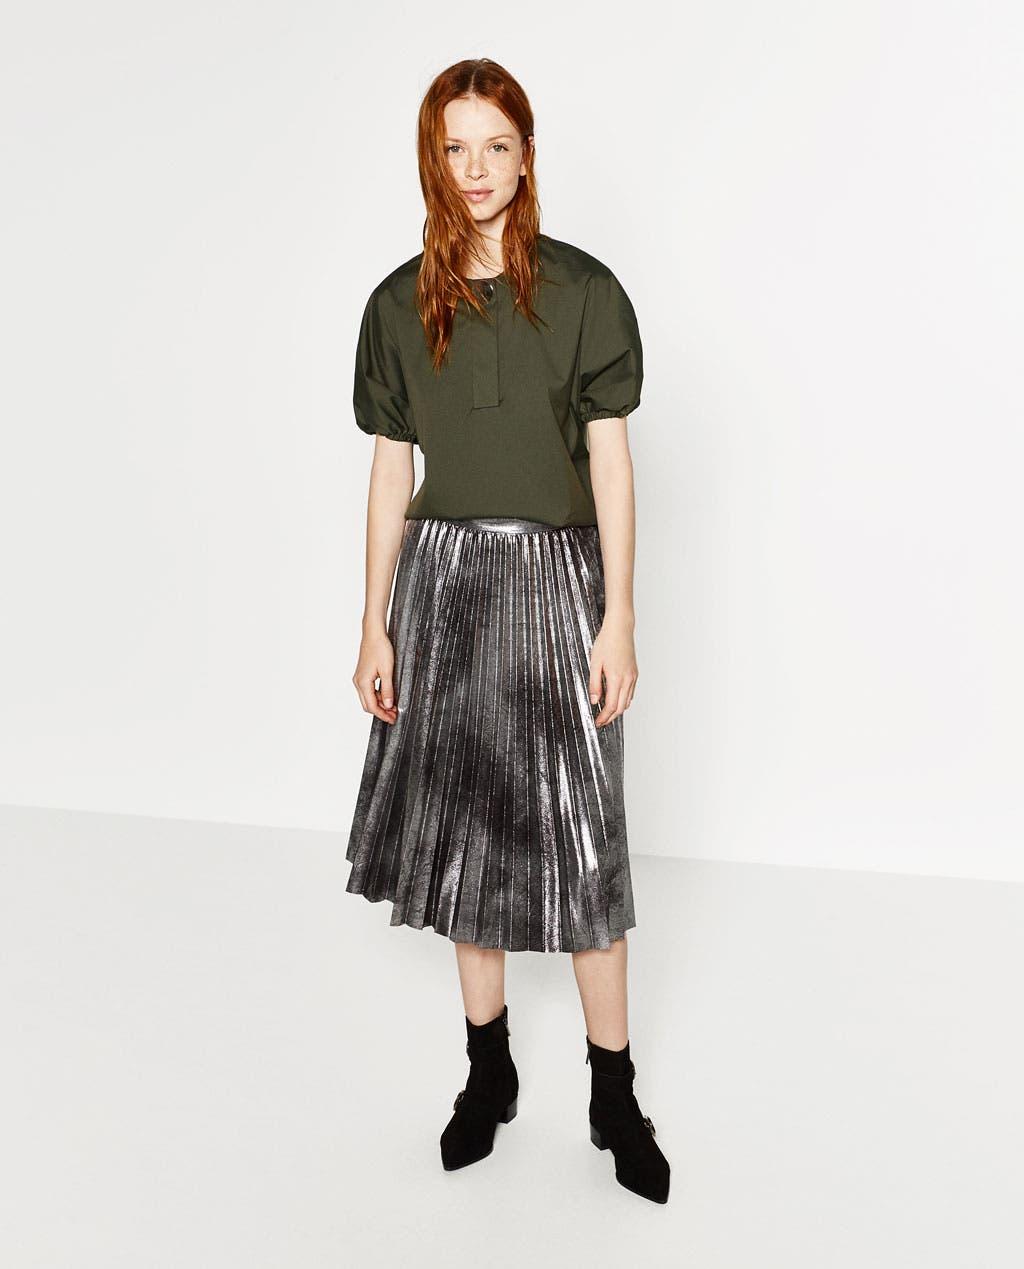 http://www.zara.com/ae/en/woman/skirts/midi/metallic-accordion-pleat-skirt-c498016p3817067.html